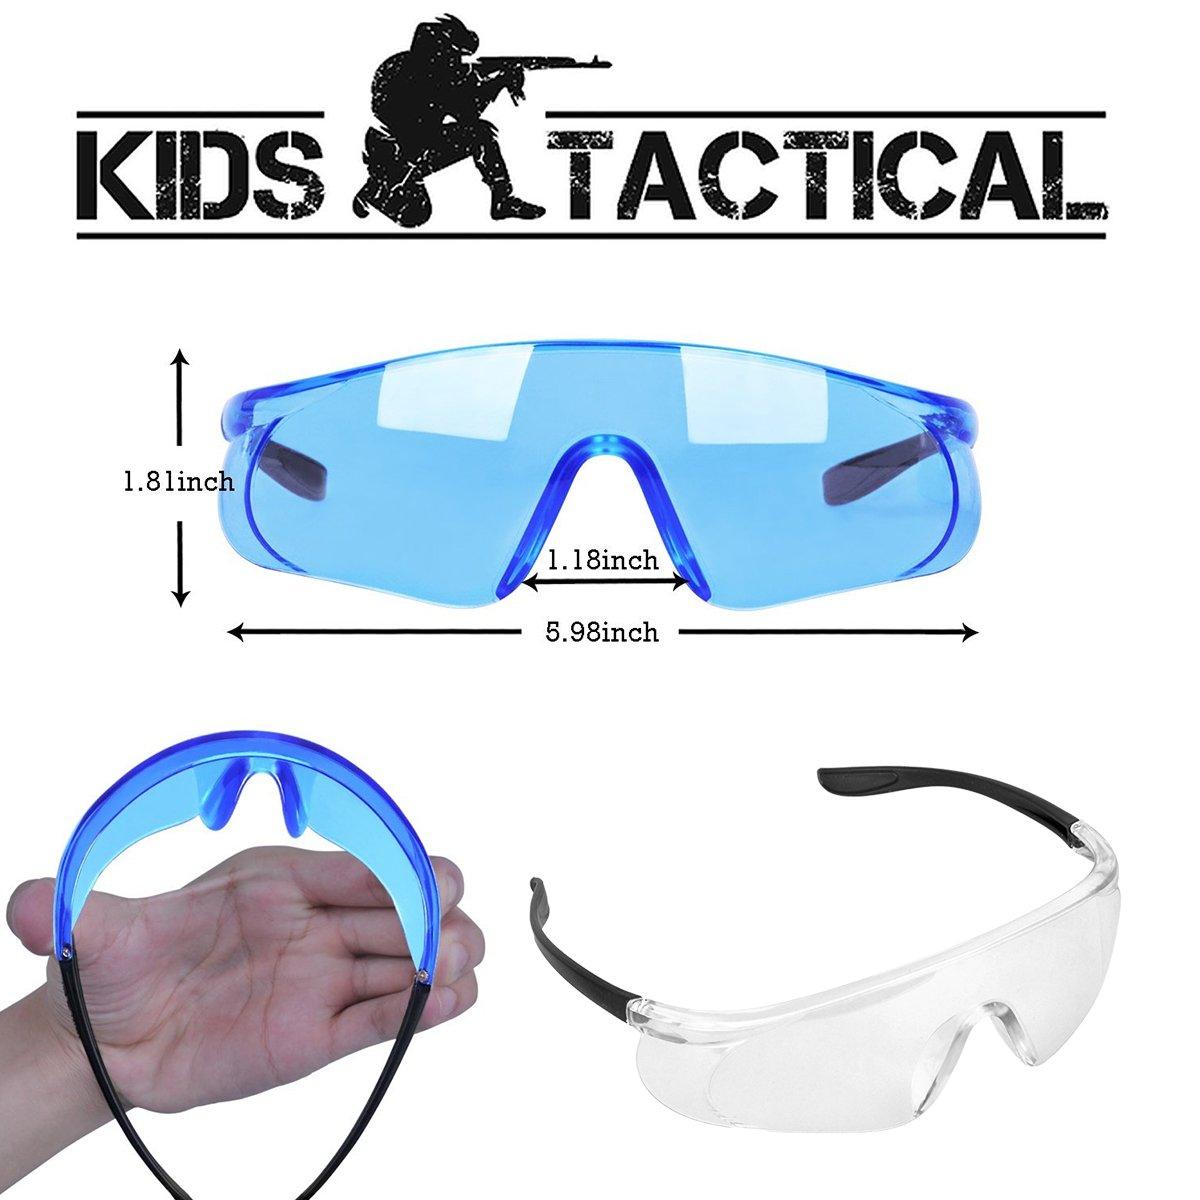 Kids Tactical Vest, 90 Pieces 2 Team Sets Adjustable Tactical Vest for Nerf Guns N-Strike Elite Series with Refill Bullets, Tactical Vests, Reload Clips, Face Masks, Wrist Bands& Glasses for Grouping